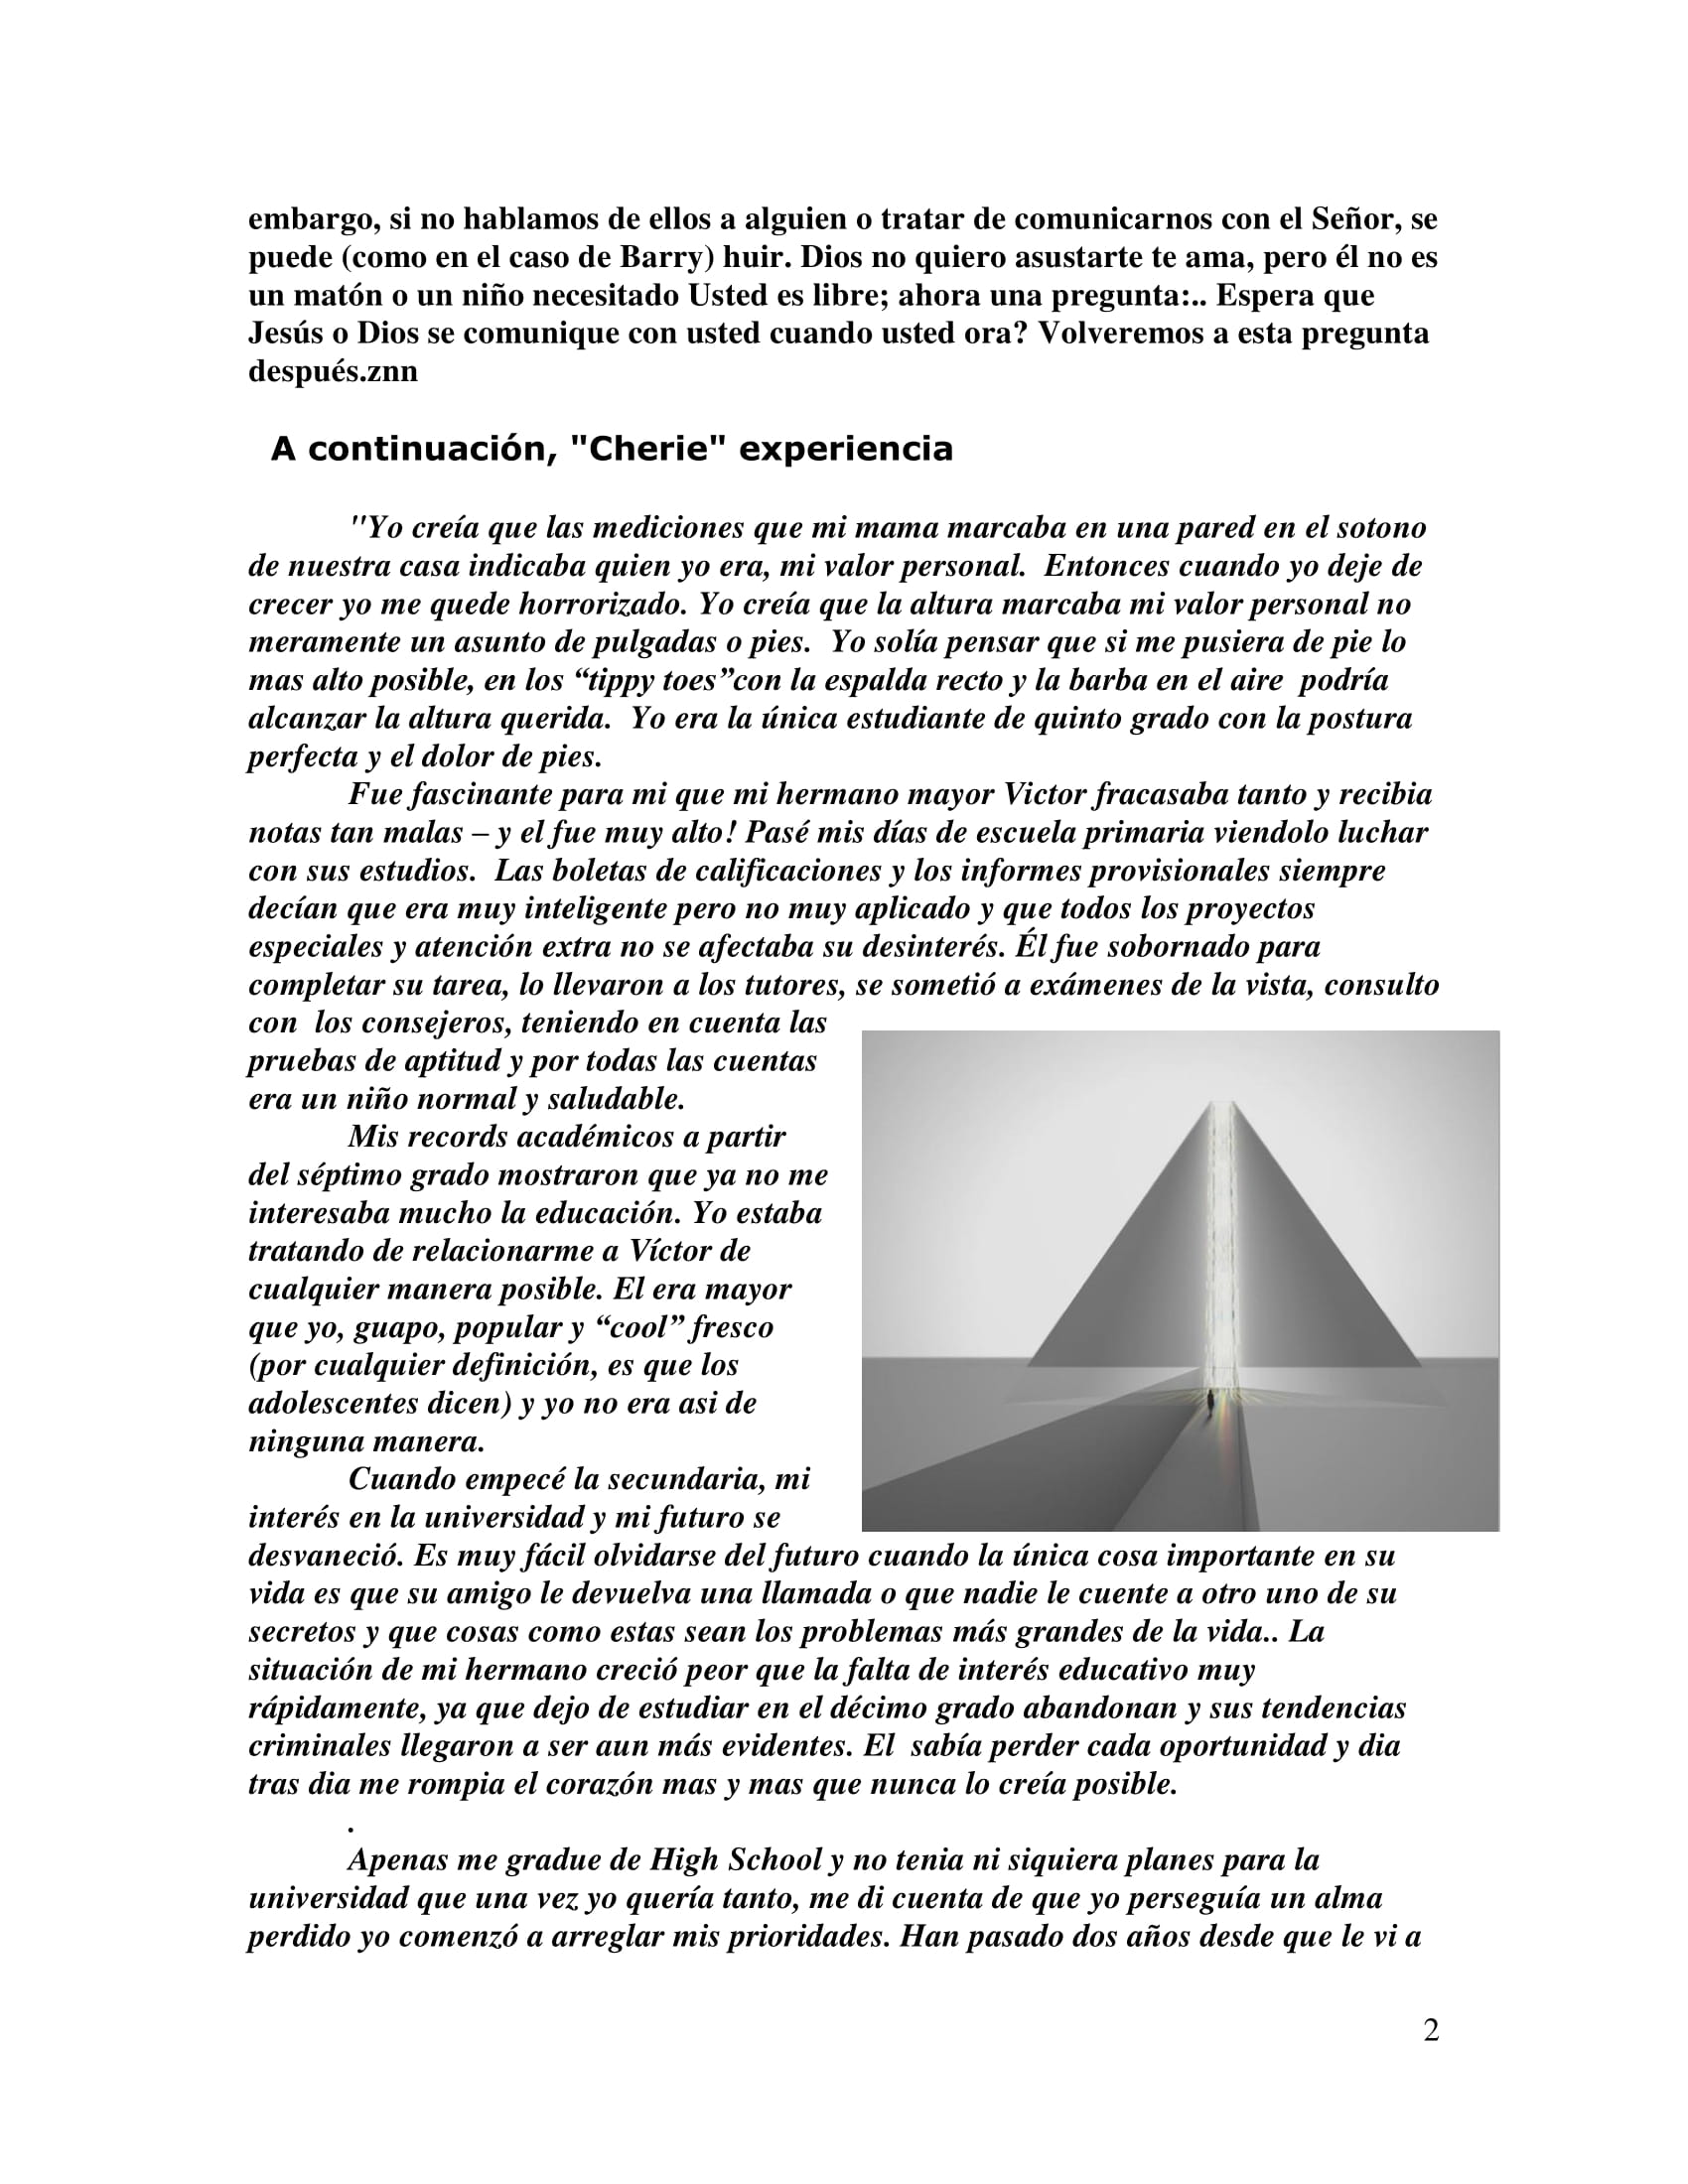 Voices From Prison 12 Spanish-2.jpg